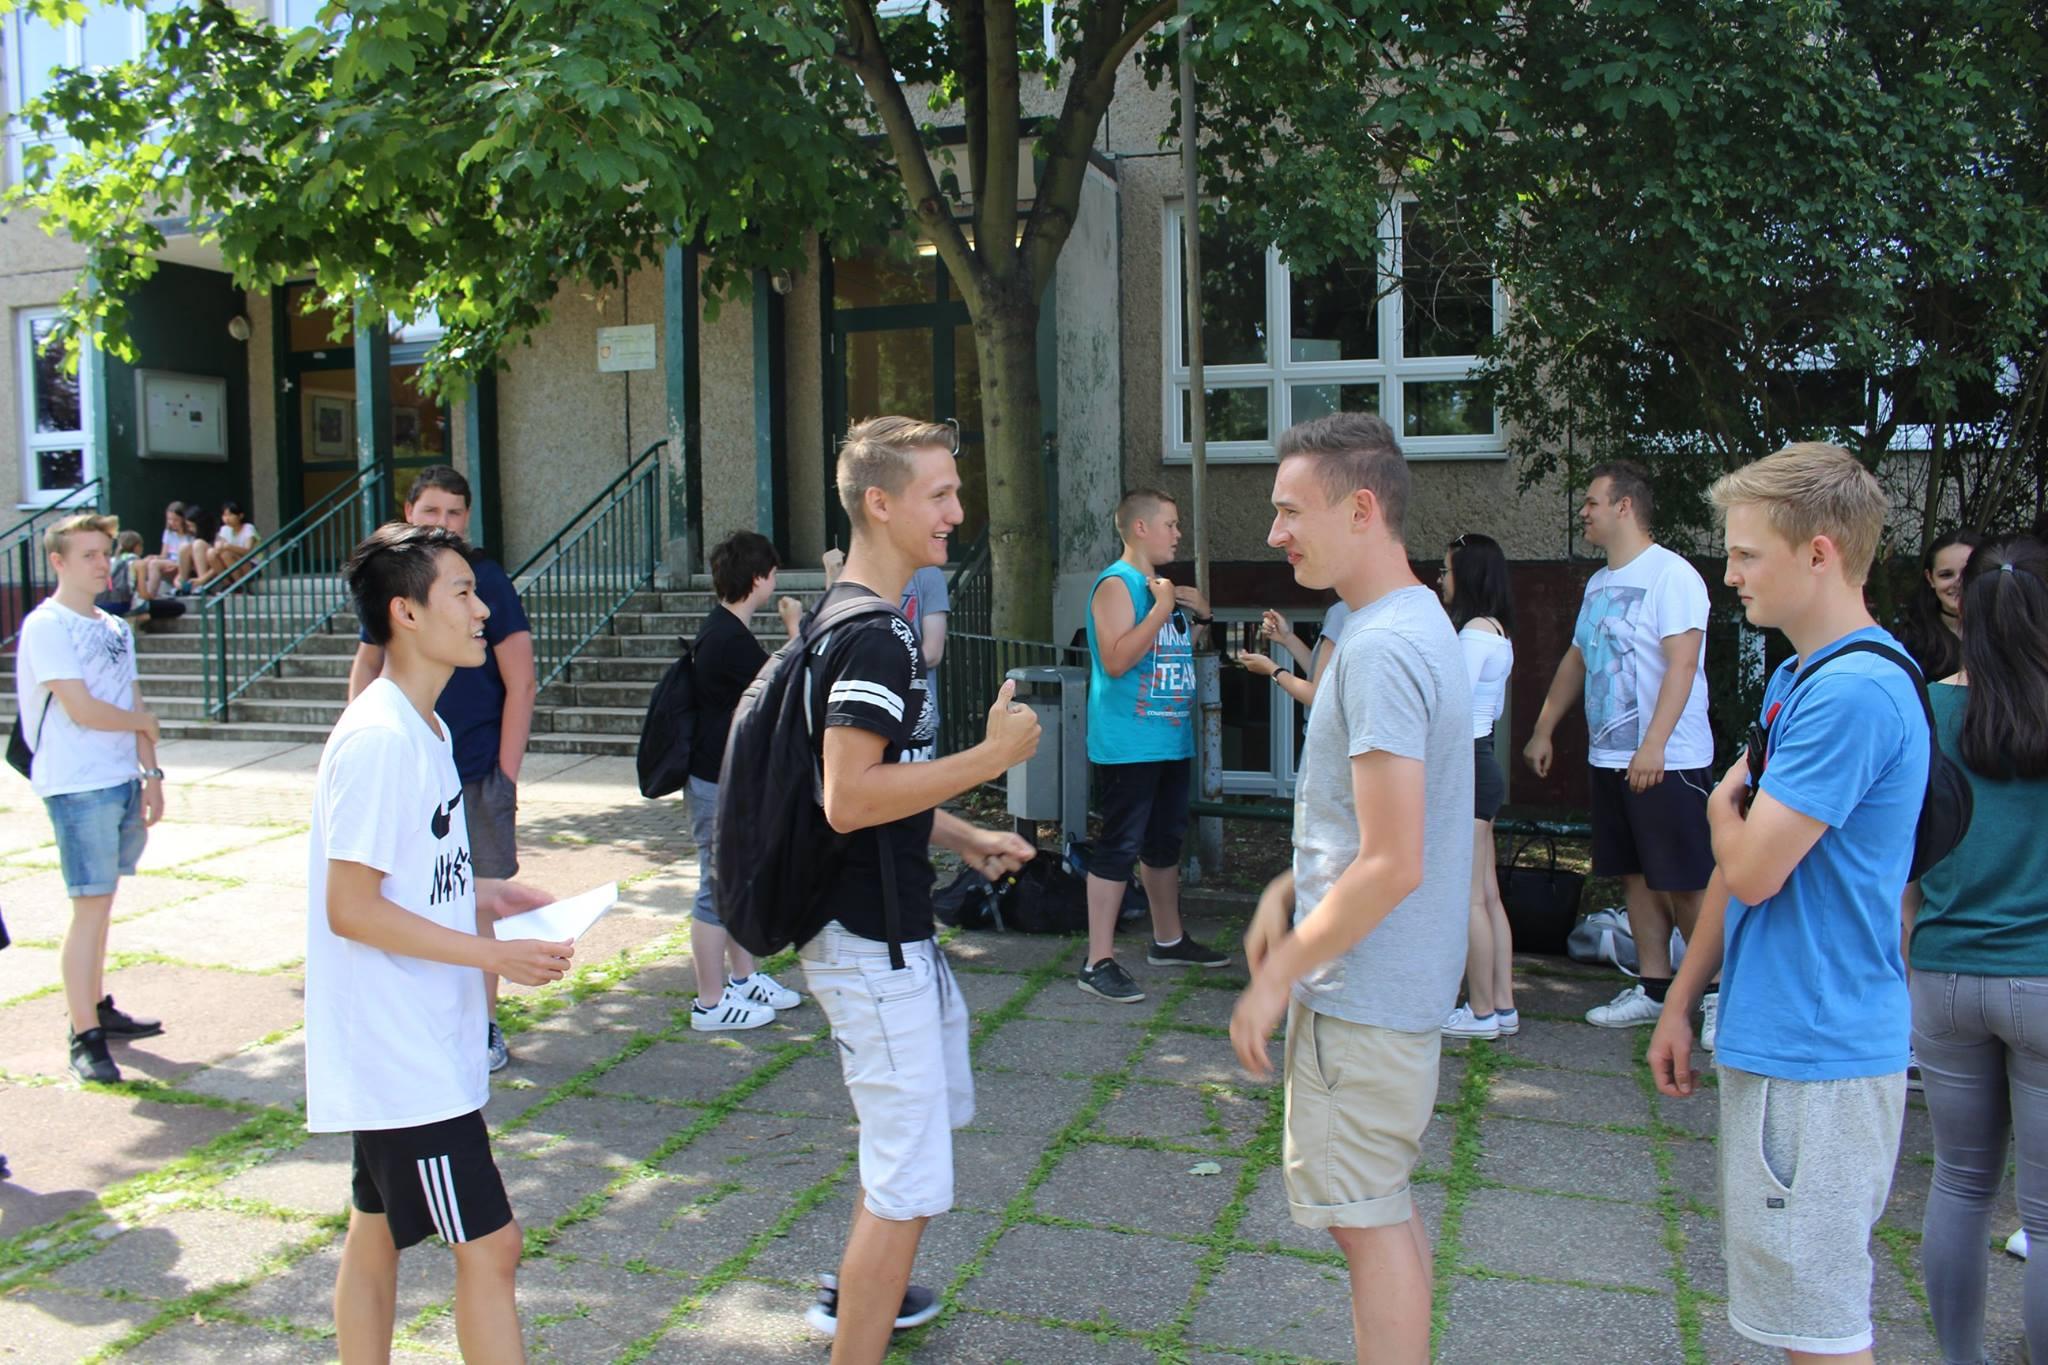 Summer School GERMANY-VISIT HHG_Erfurt_(21.06.2017)_photo3